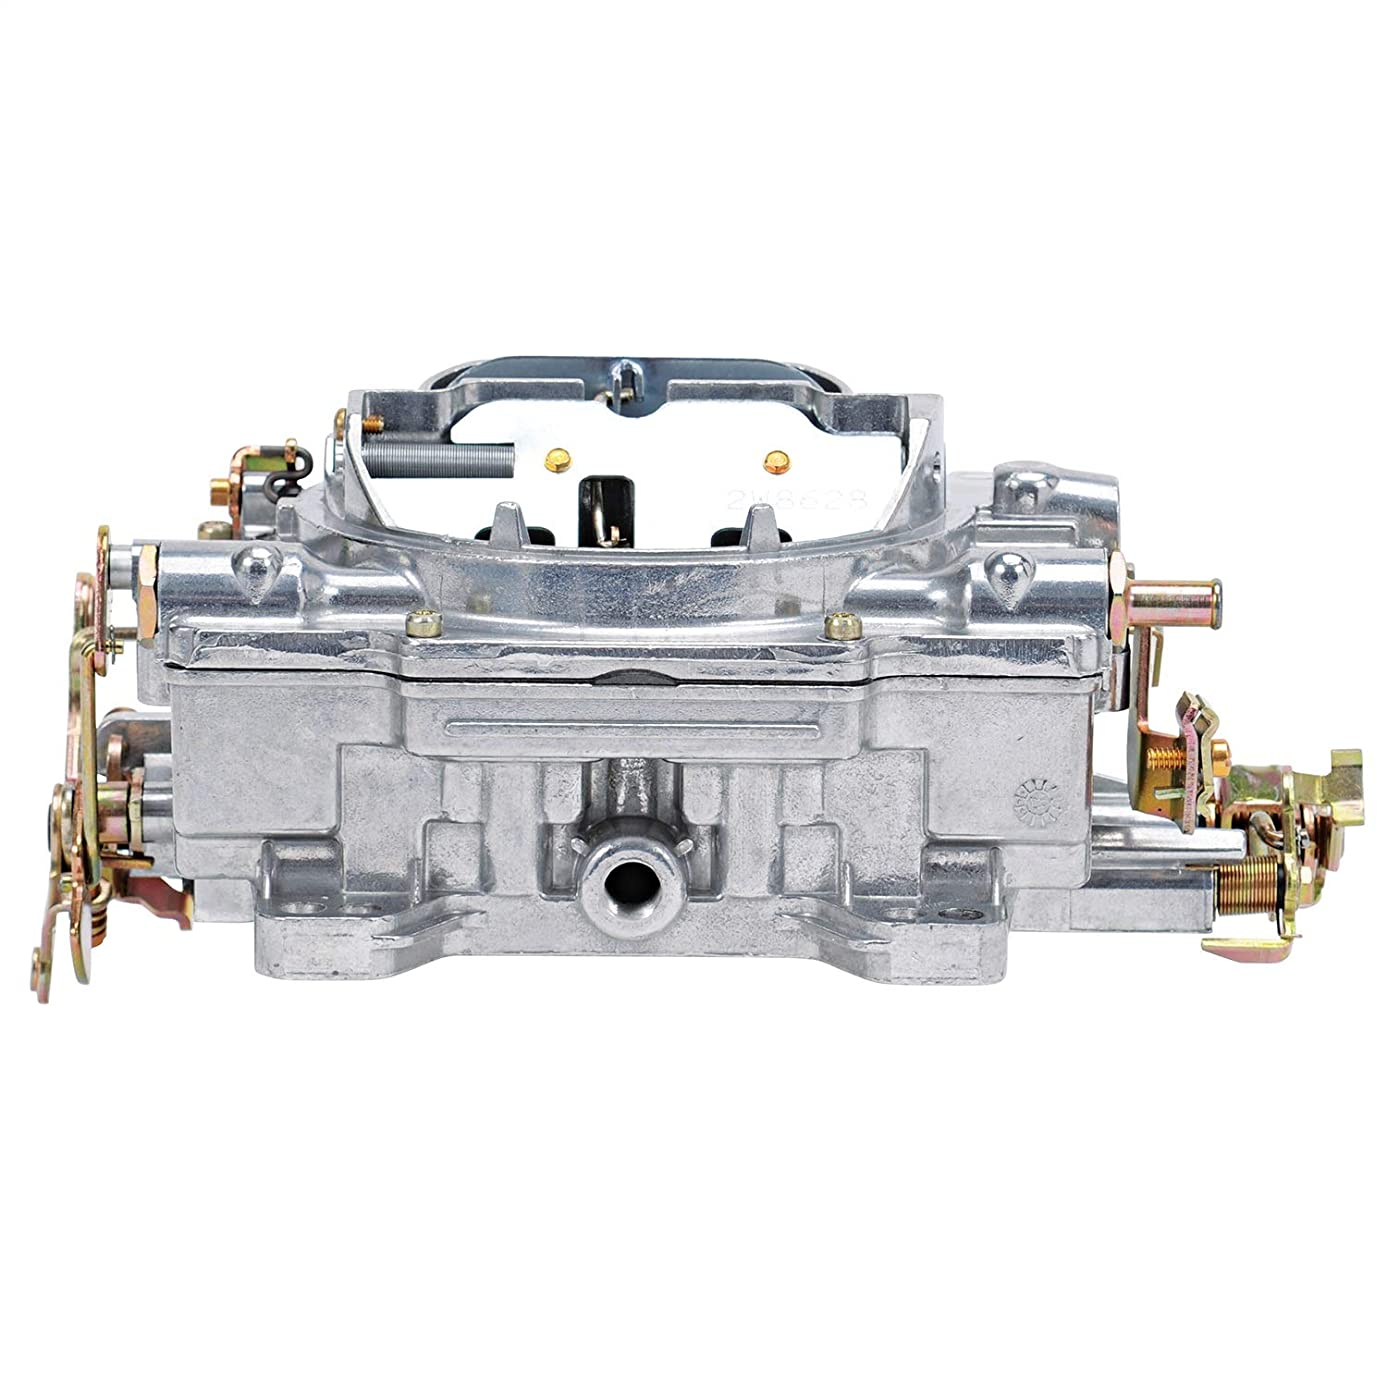 Edelbrock 1905 Carburetor